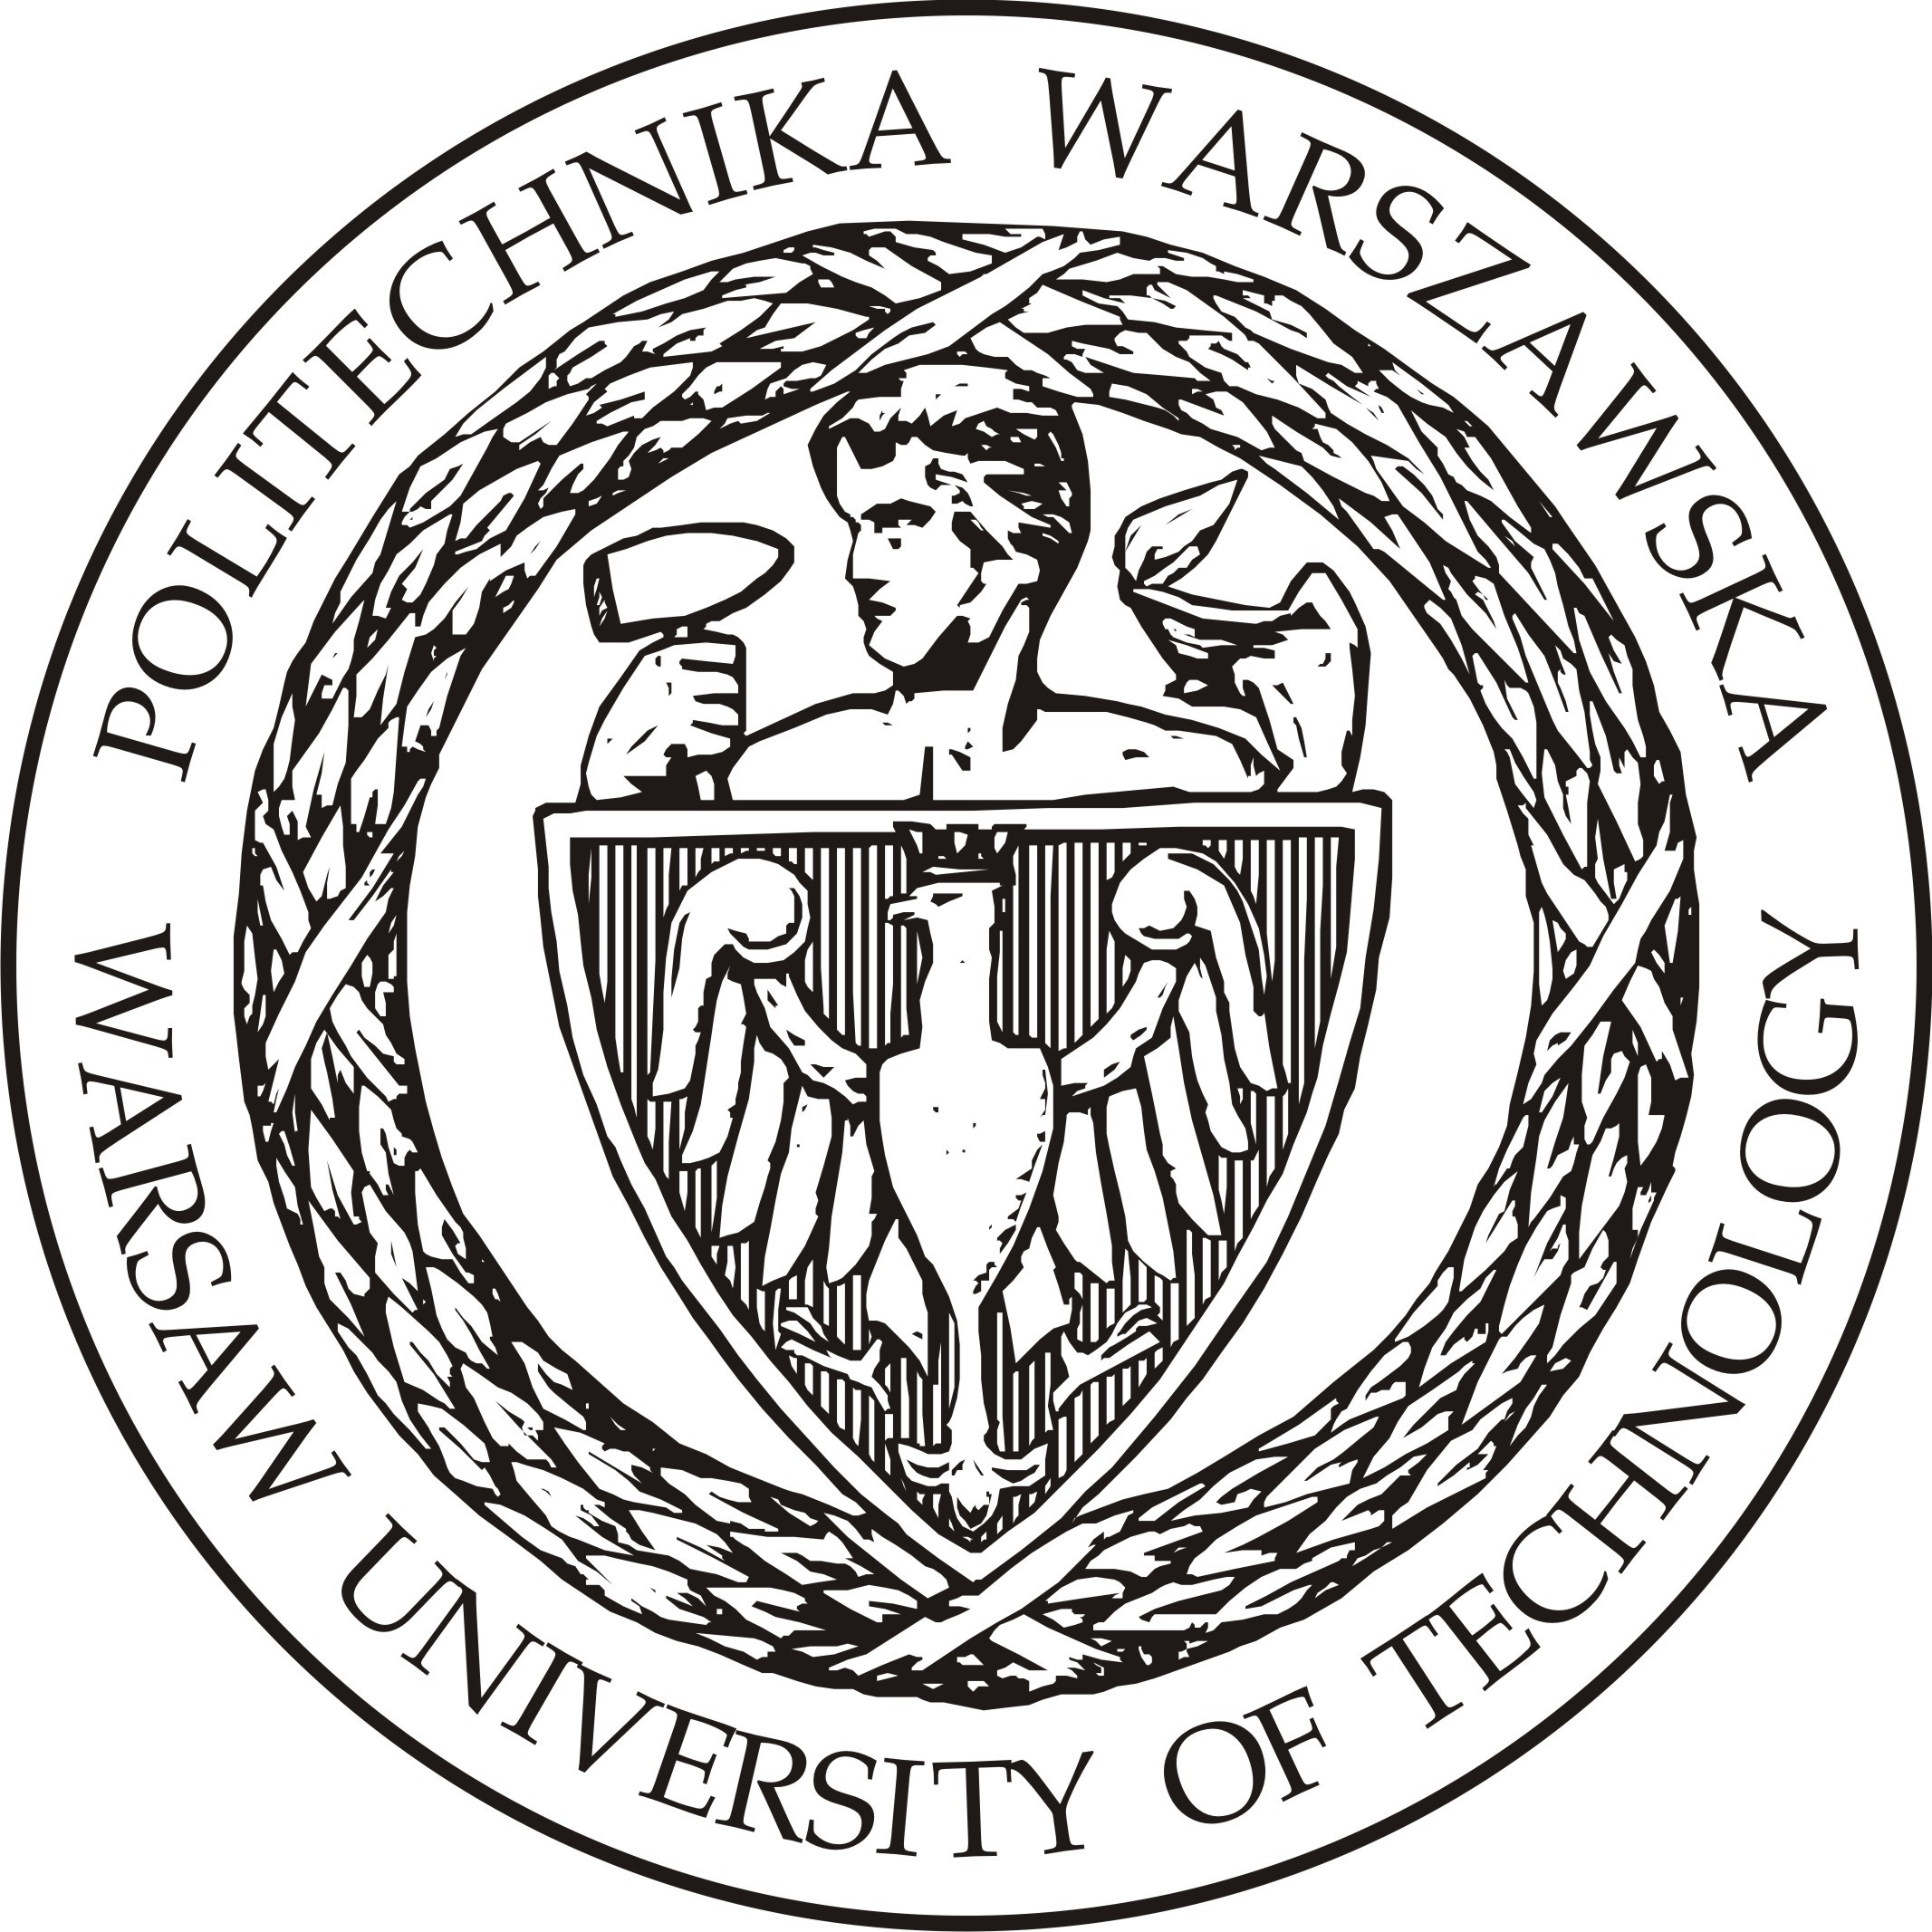 politechnikawarszawska